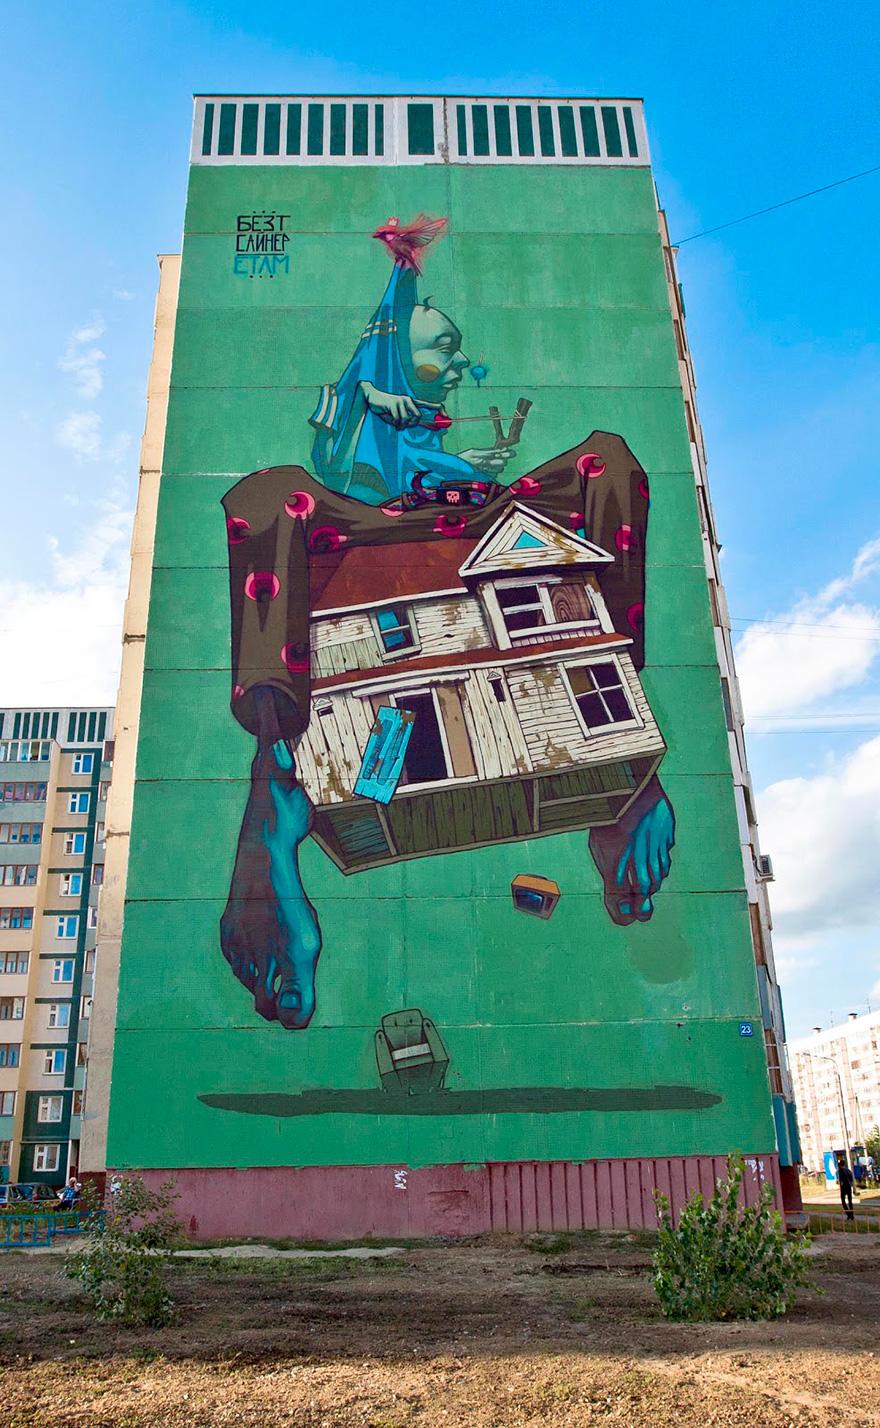 murals-street-art-graffiti-sainer-bezt-etam-cru-5